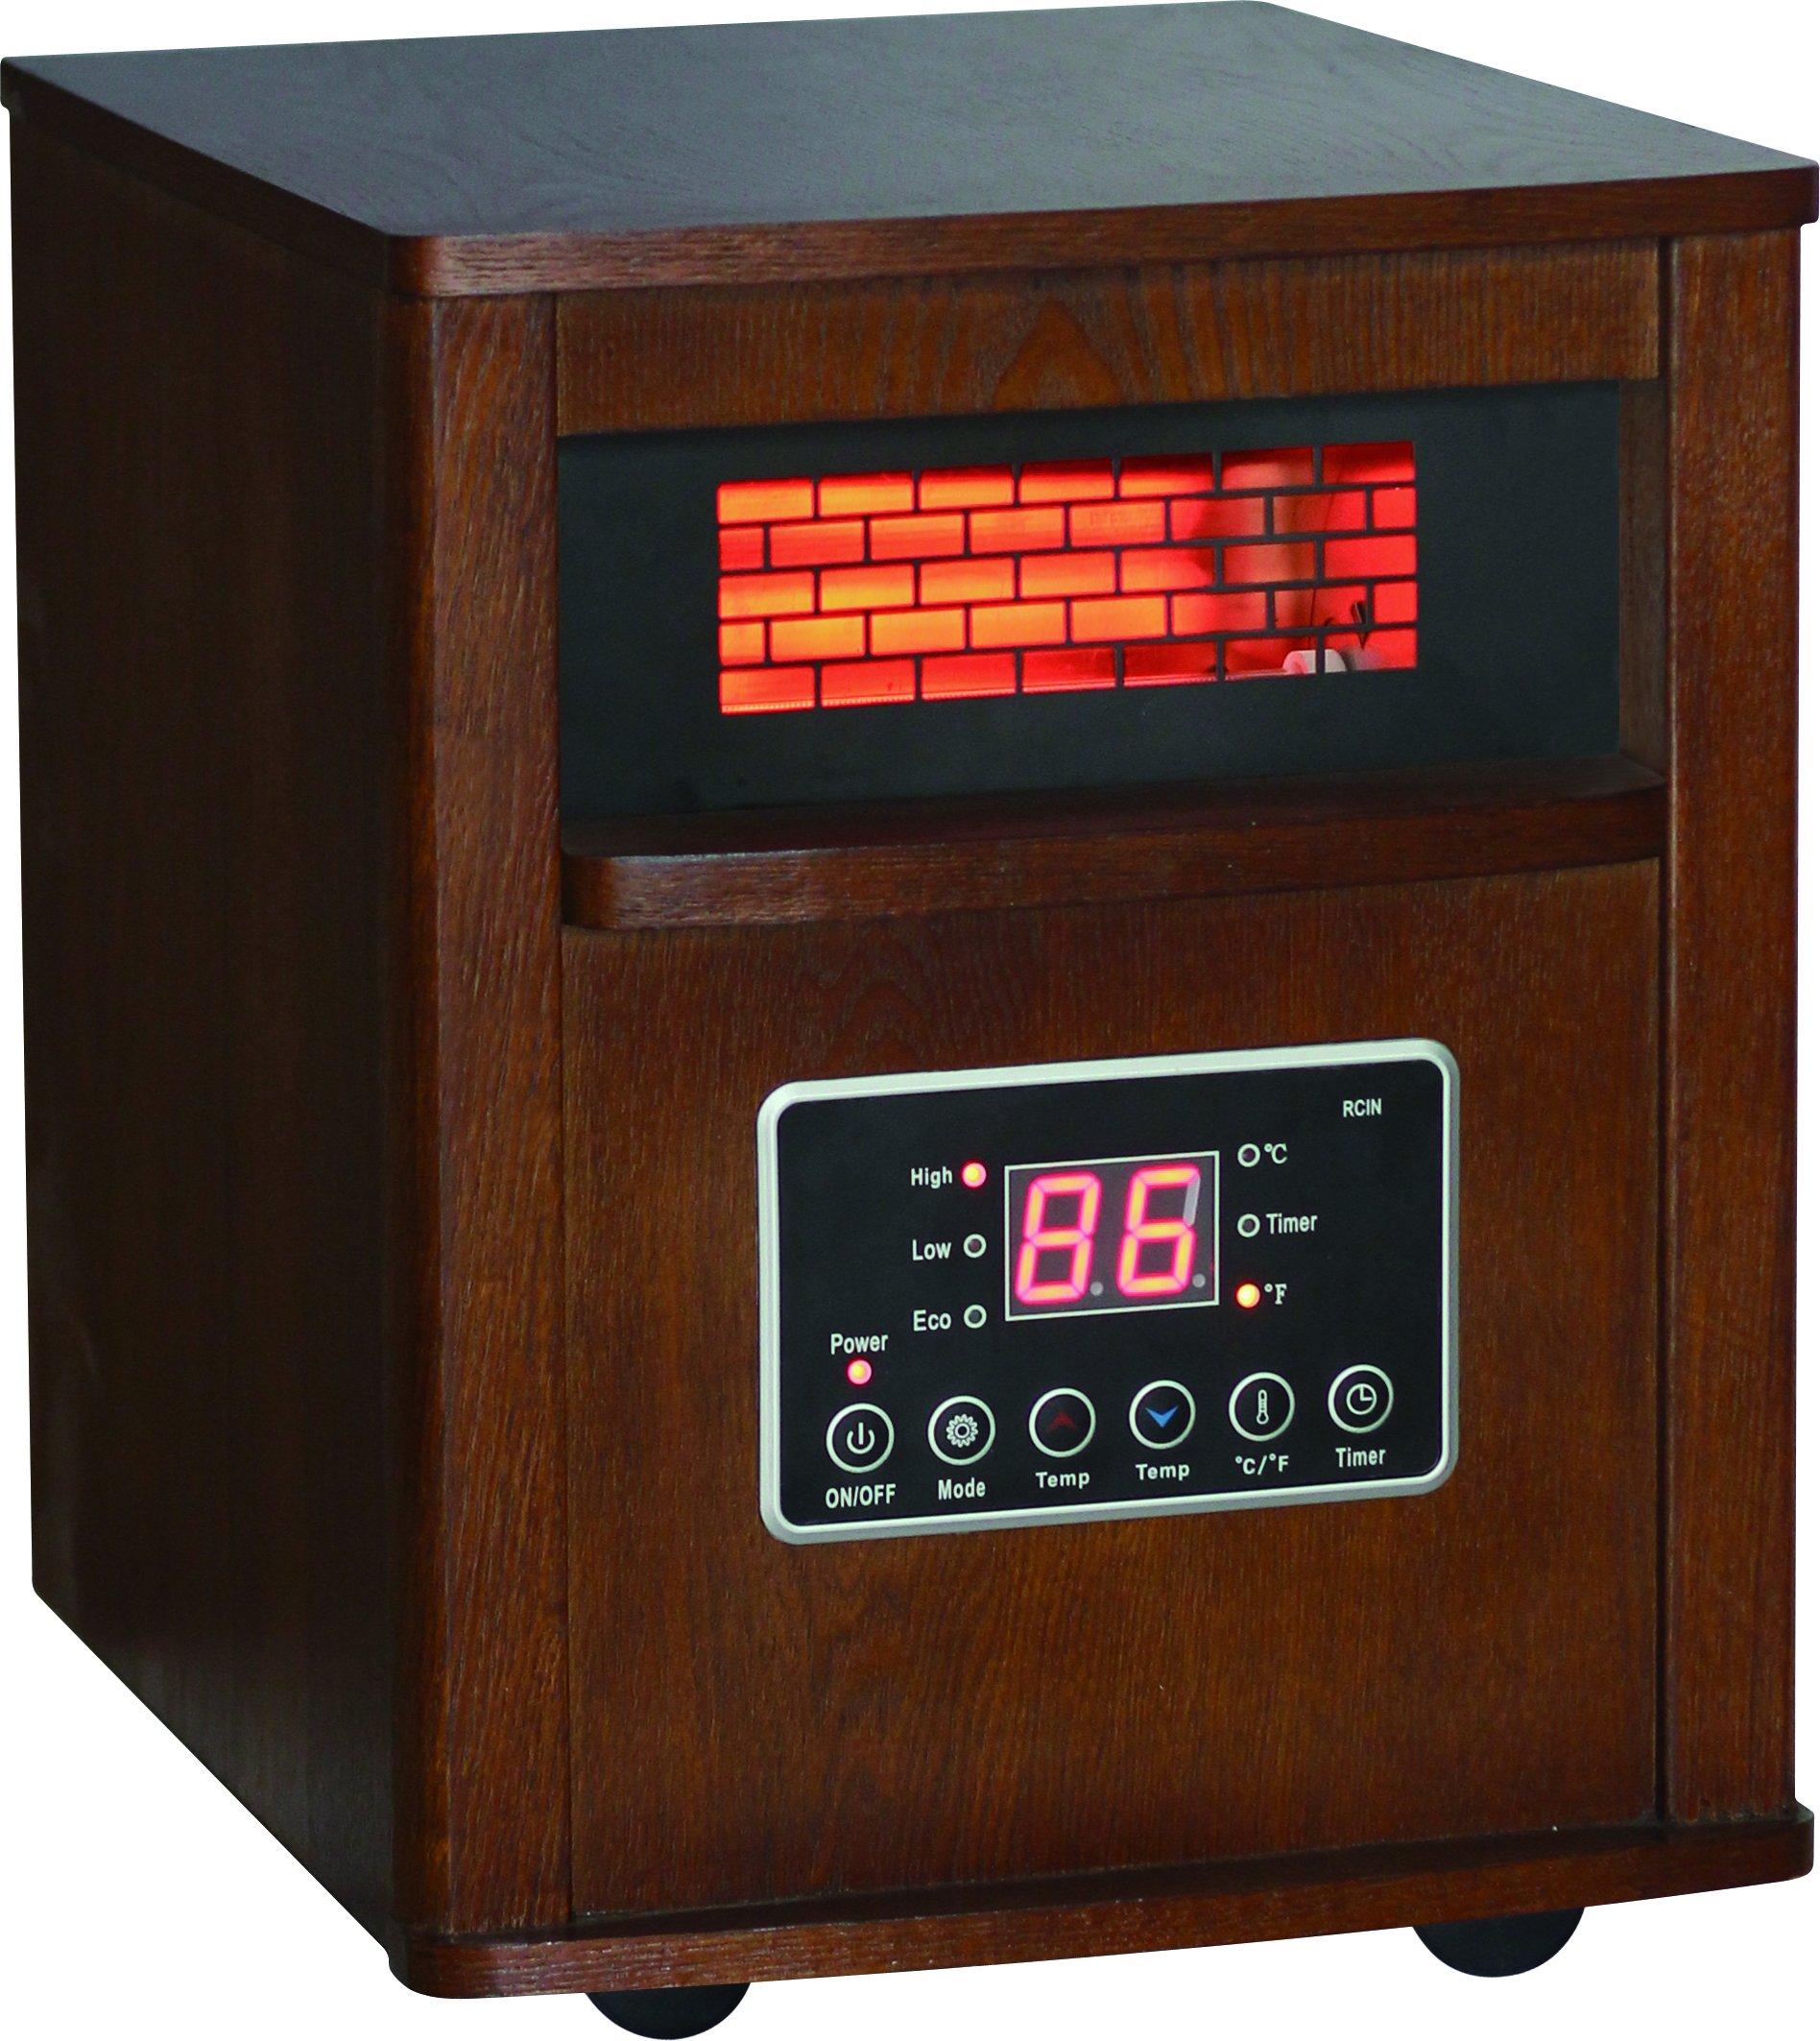 Dura Heat DH2000C Infrared Quartz Heater, 5120 BTU